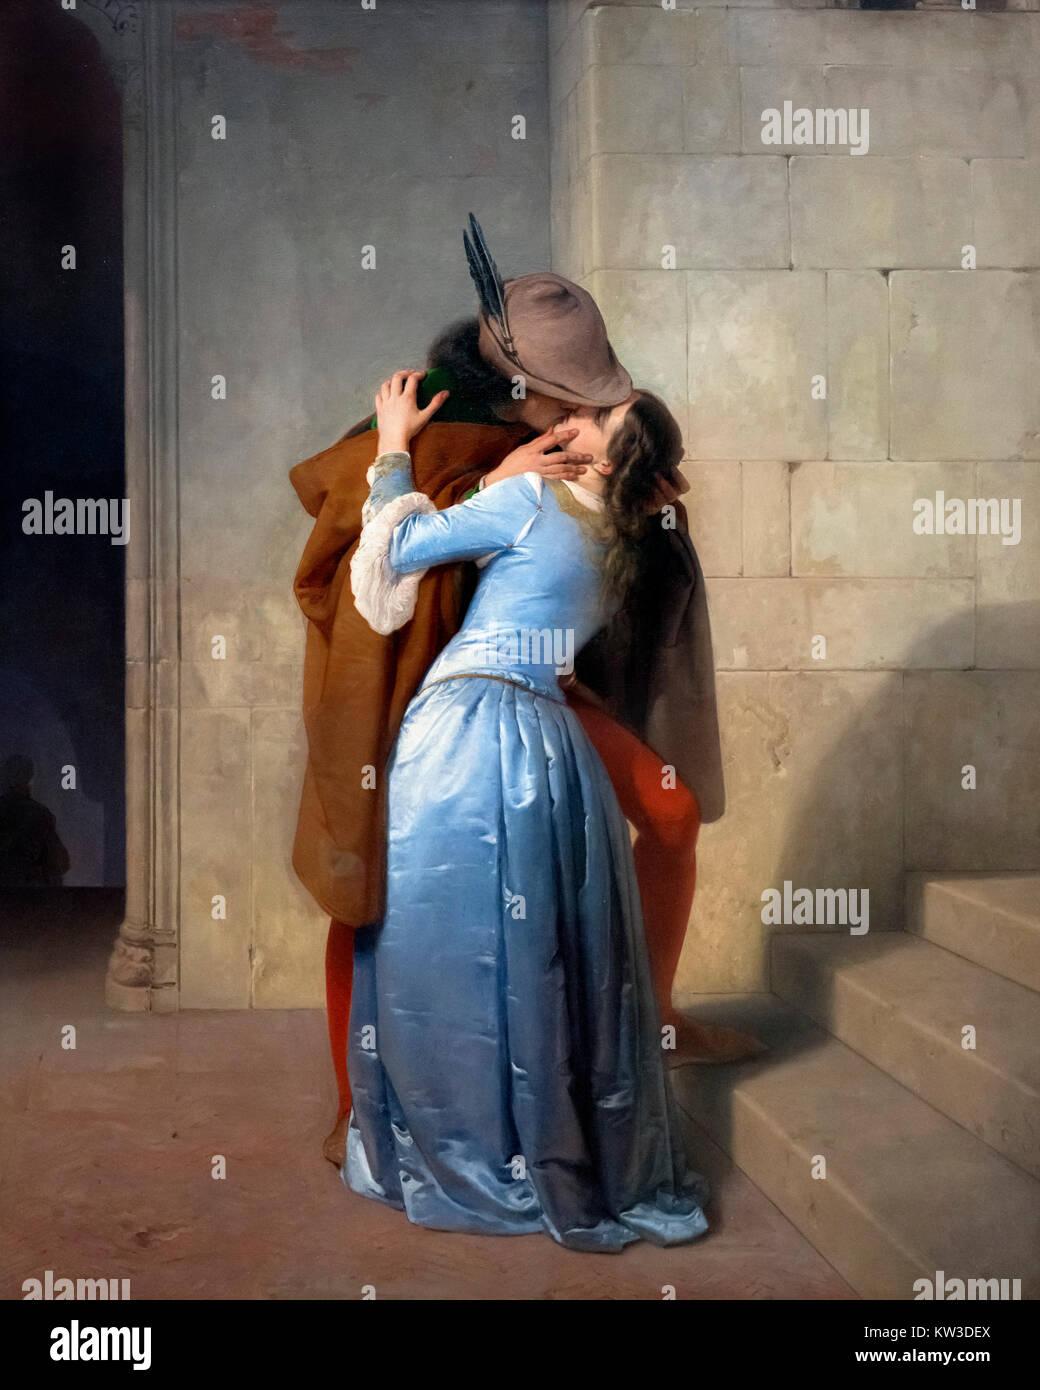 The Kiss (Il Bacio) by Francesco Hayez  (1791-1882), oil on canvas, 1859 - Stock Image